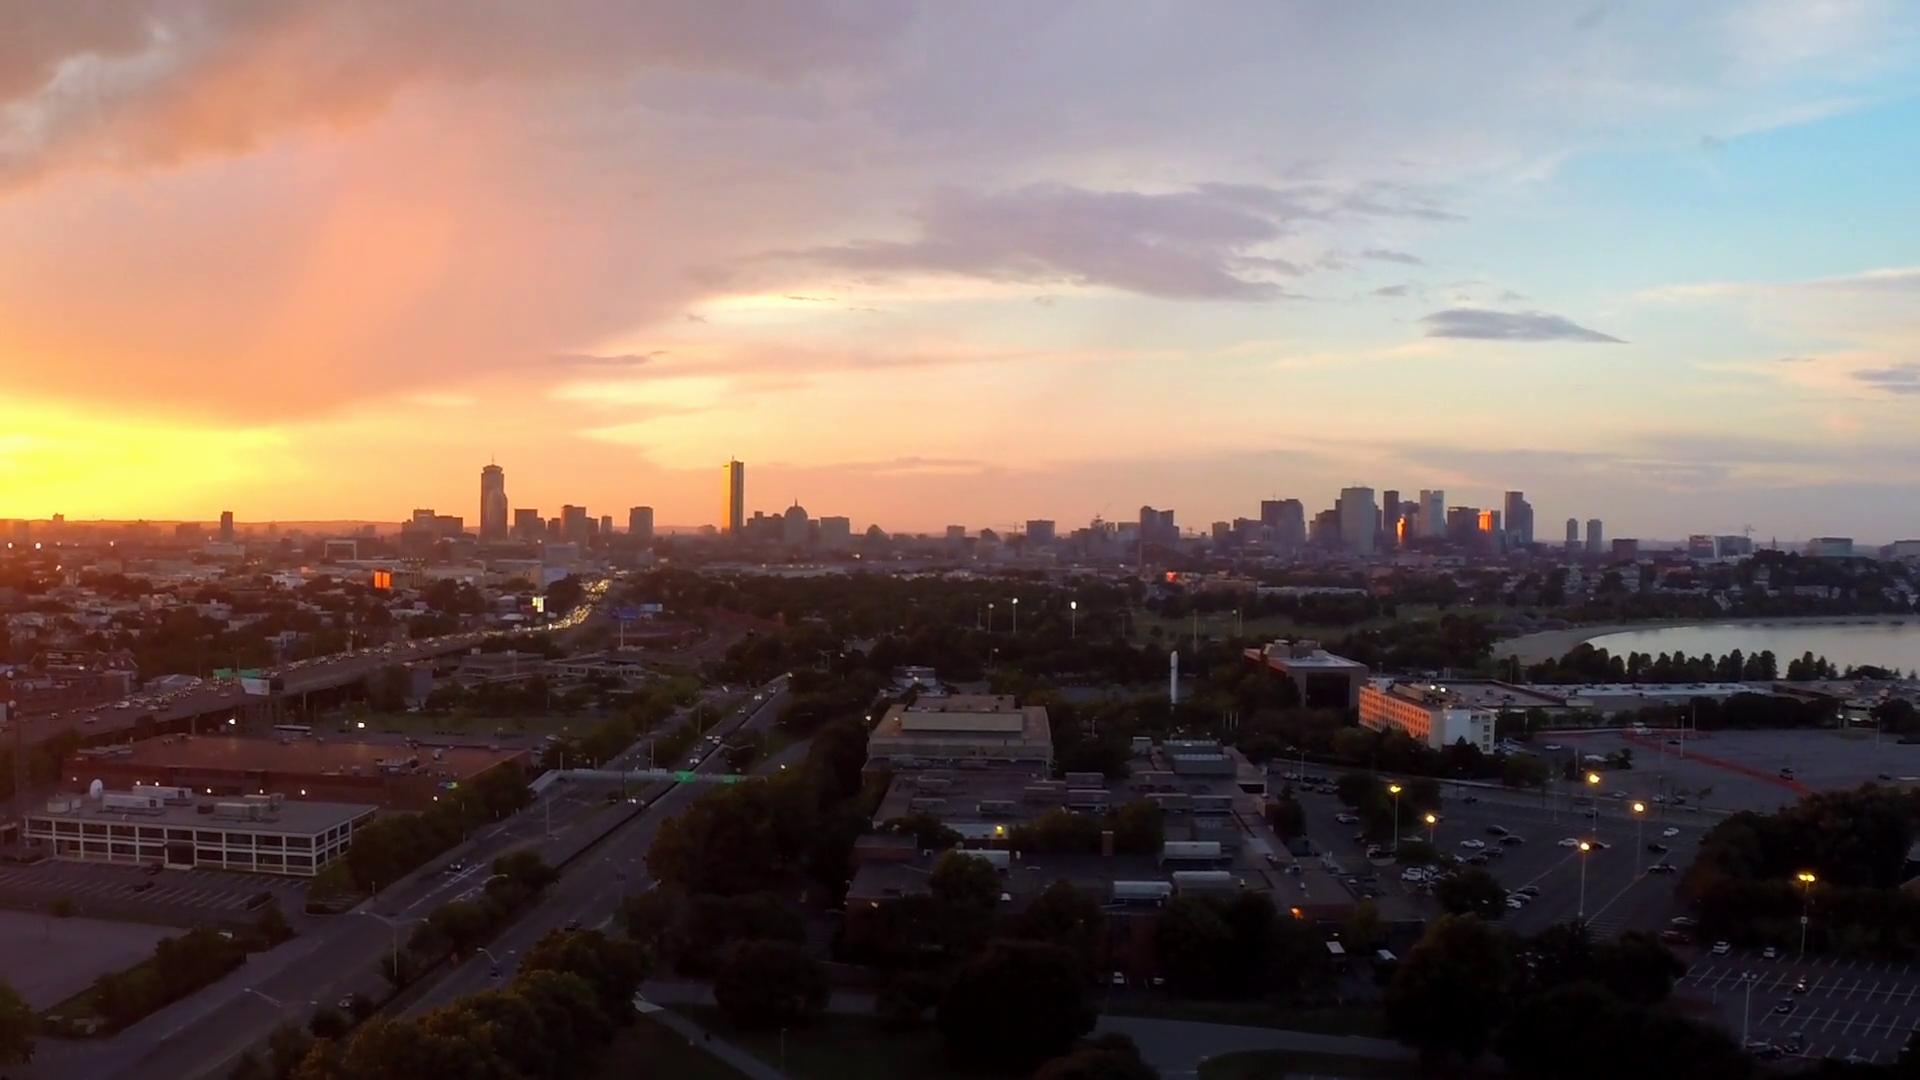 Phantom Stock Agreement Template Elegant Stationary Aerial View Boston Skyline with Sunset Fast